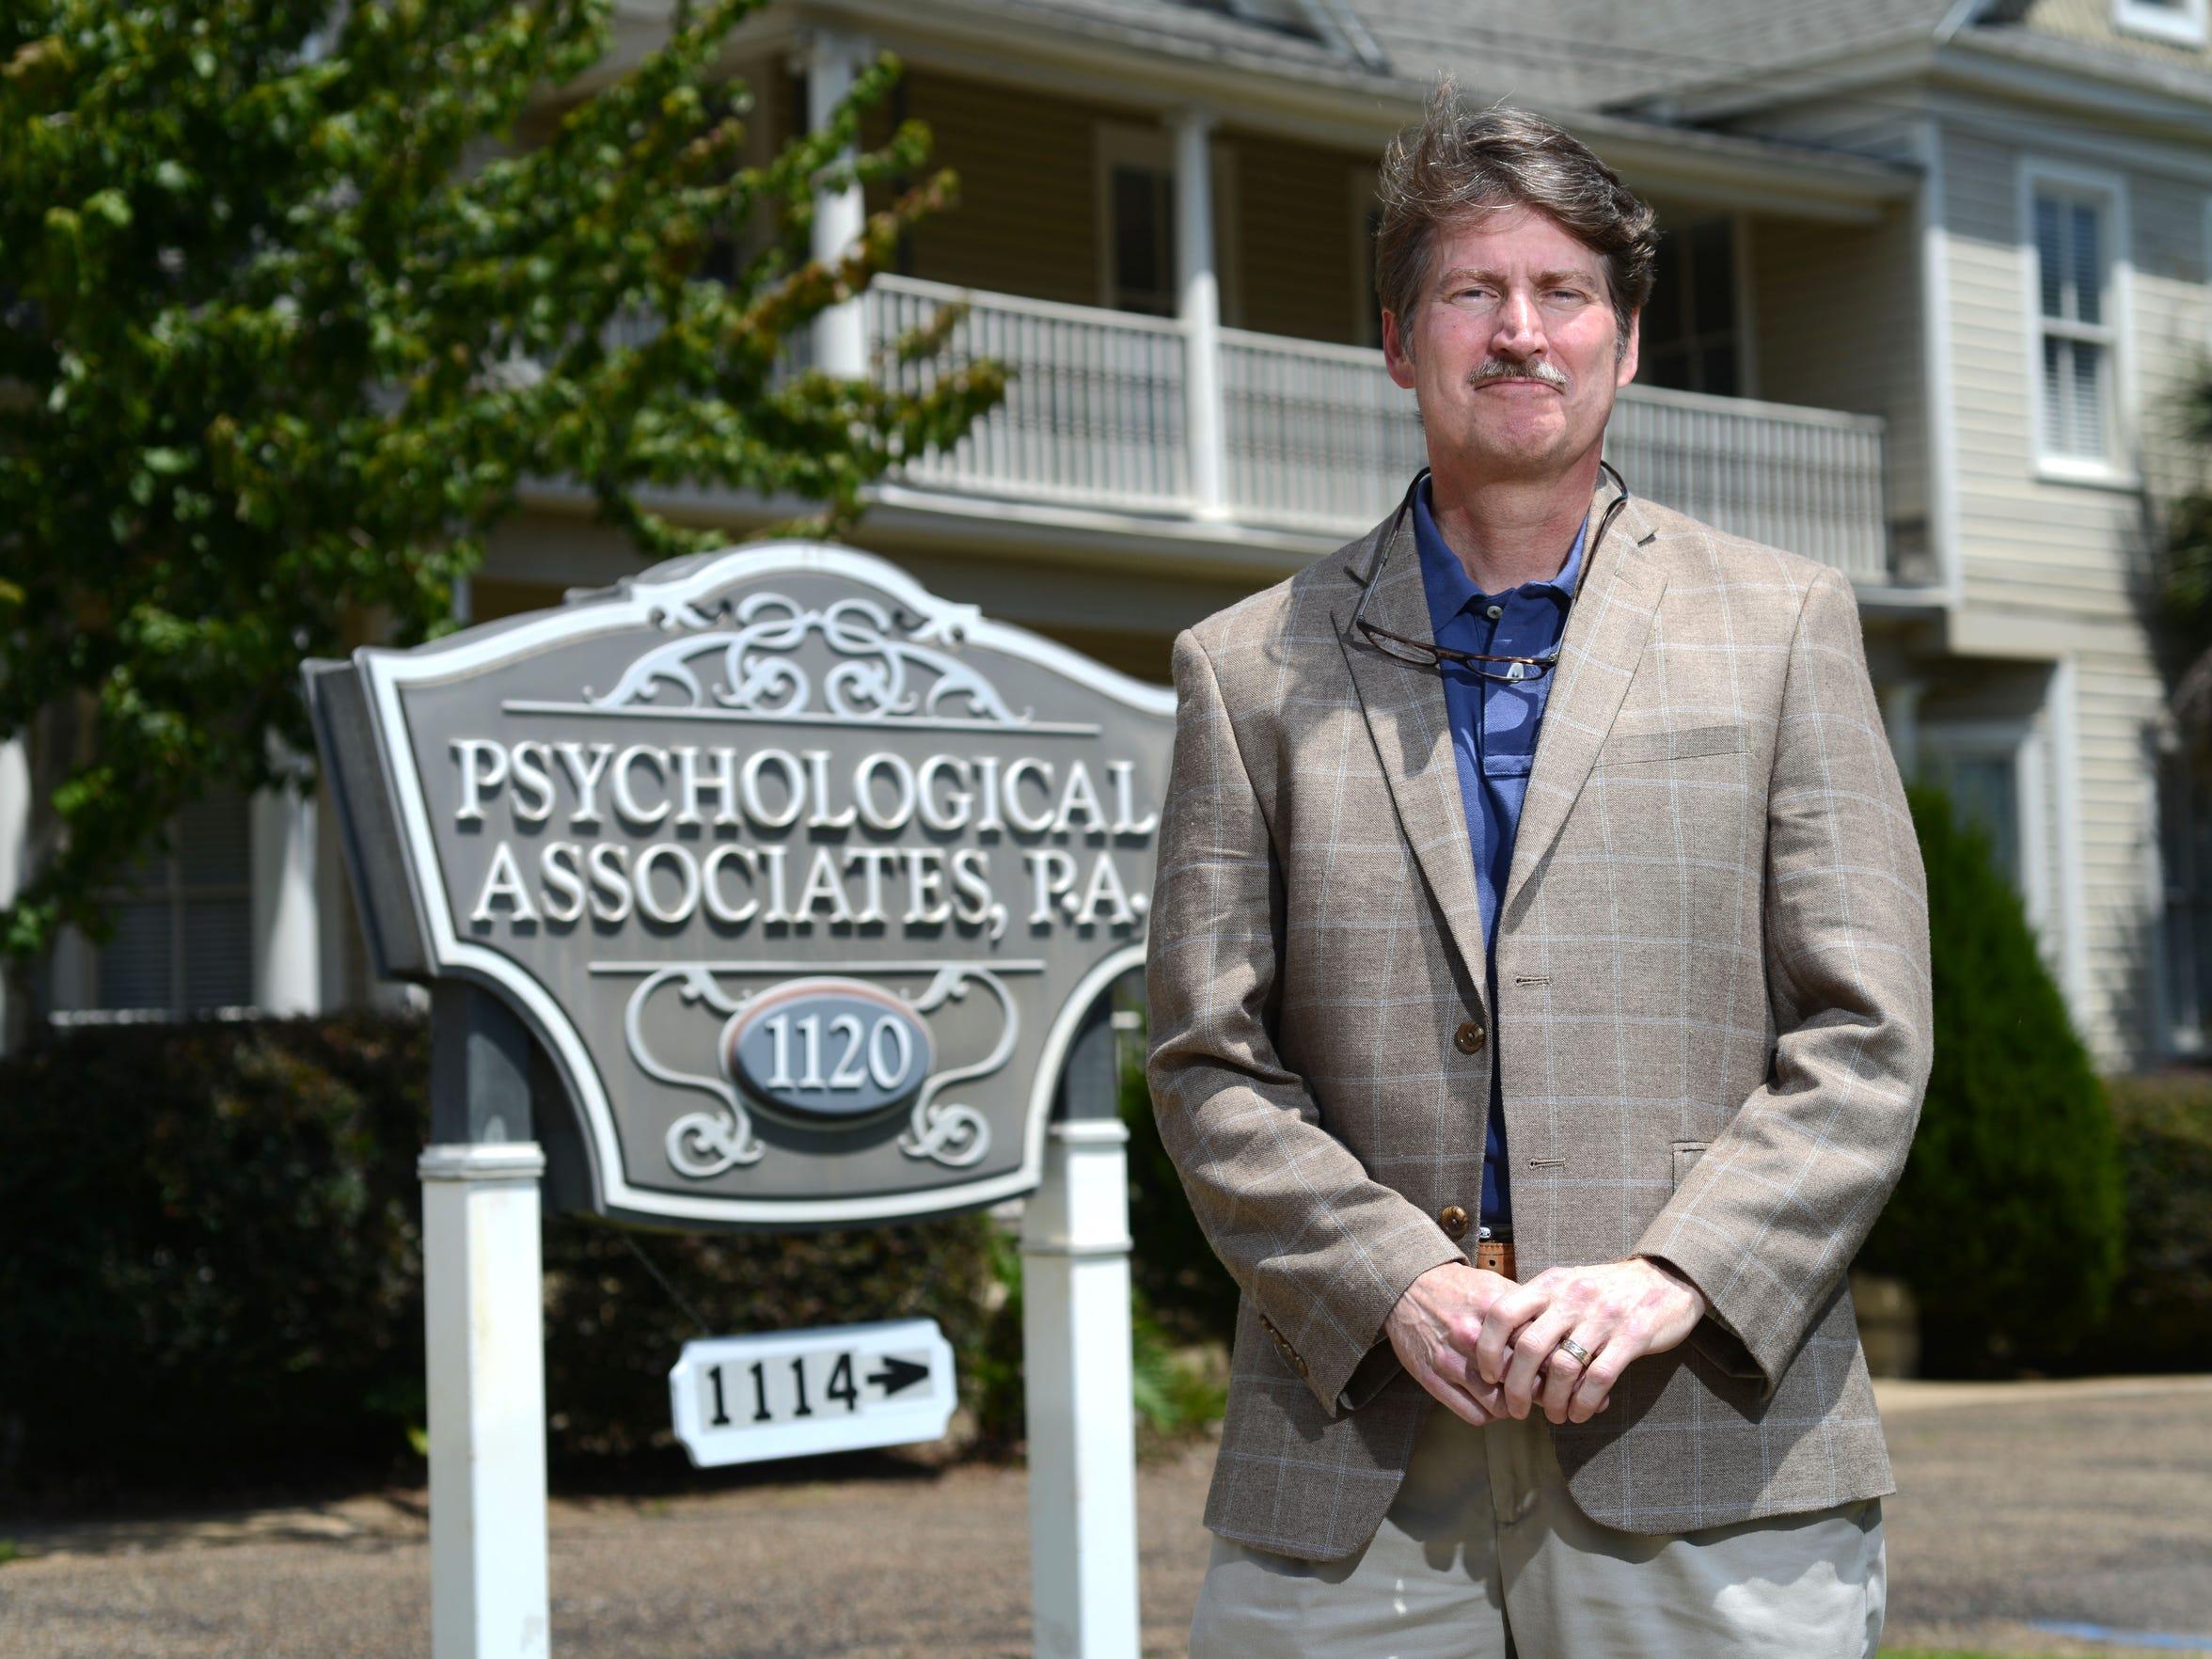 Psycologist Dr. Rick Spencer, with Psychological Associates,